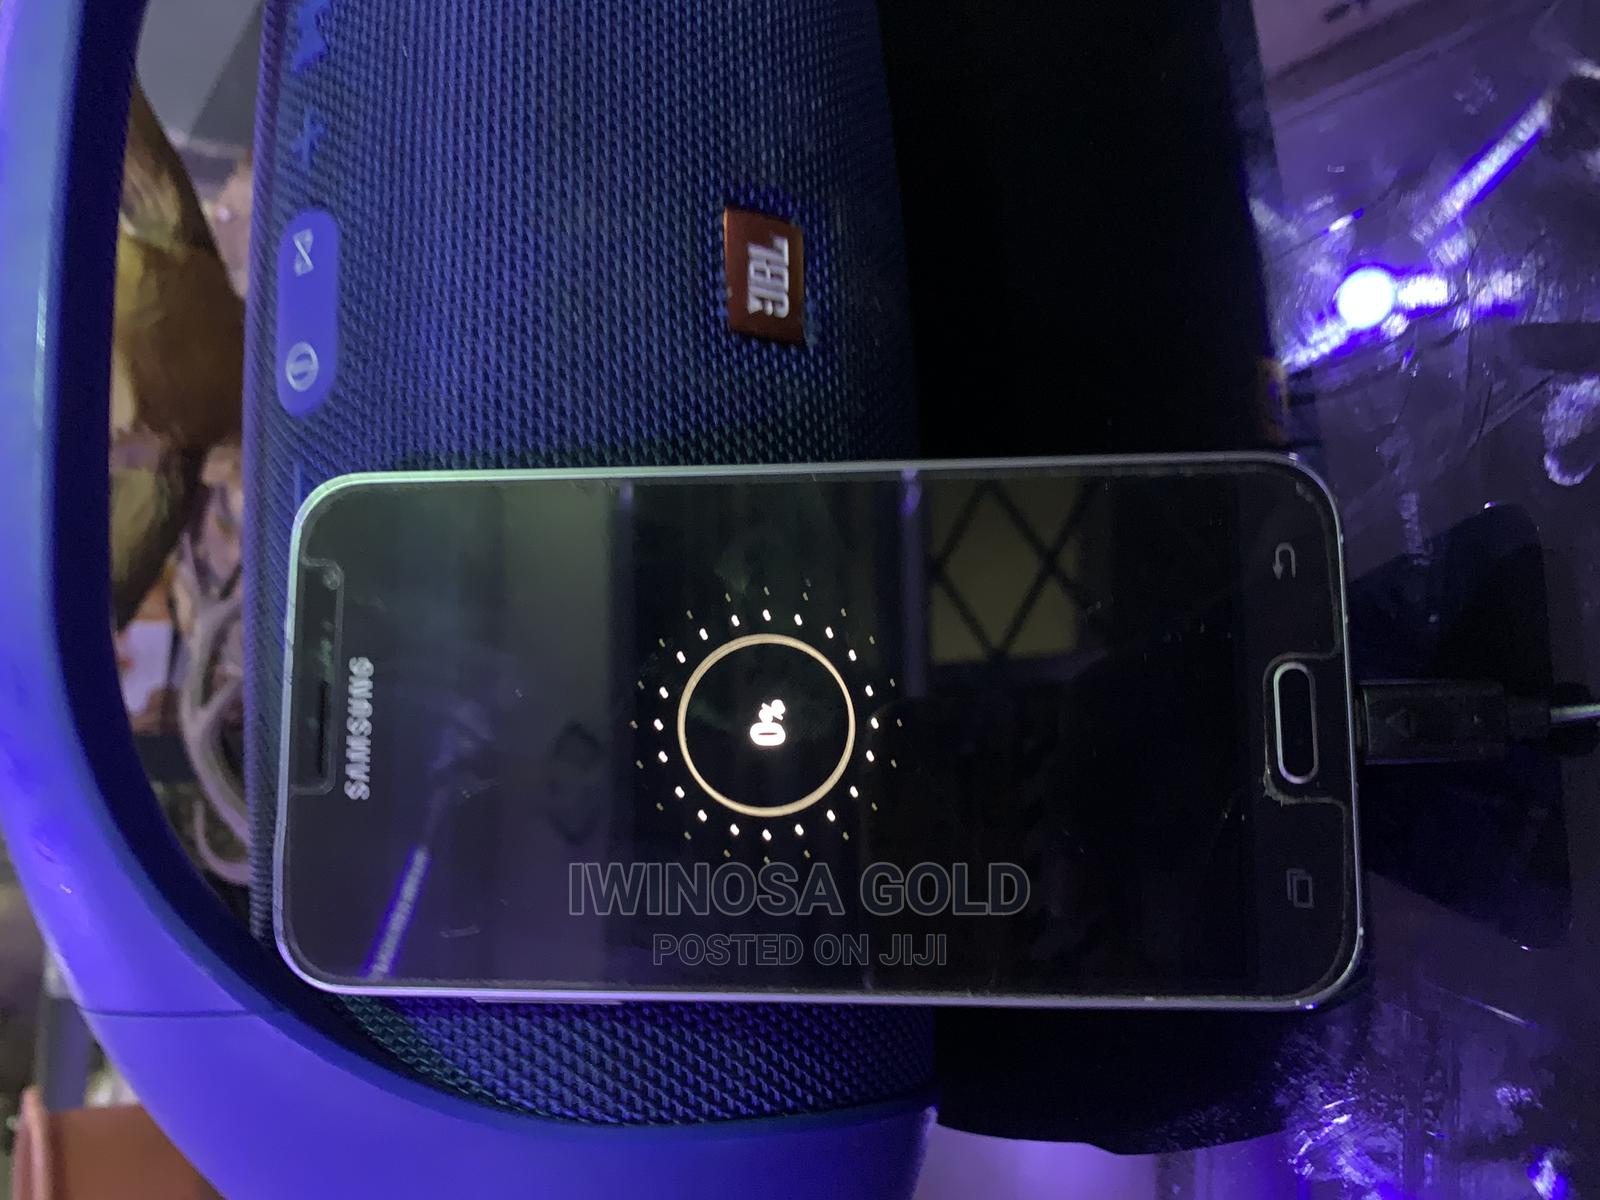 Samsung Galaxy J3 16 GB Black   Mobile Phones for sale in Benin City, Edo State, Nigeria